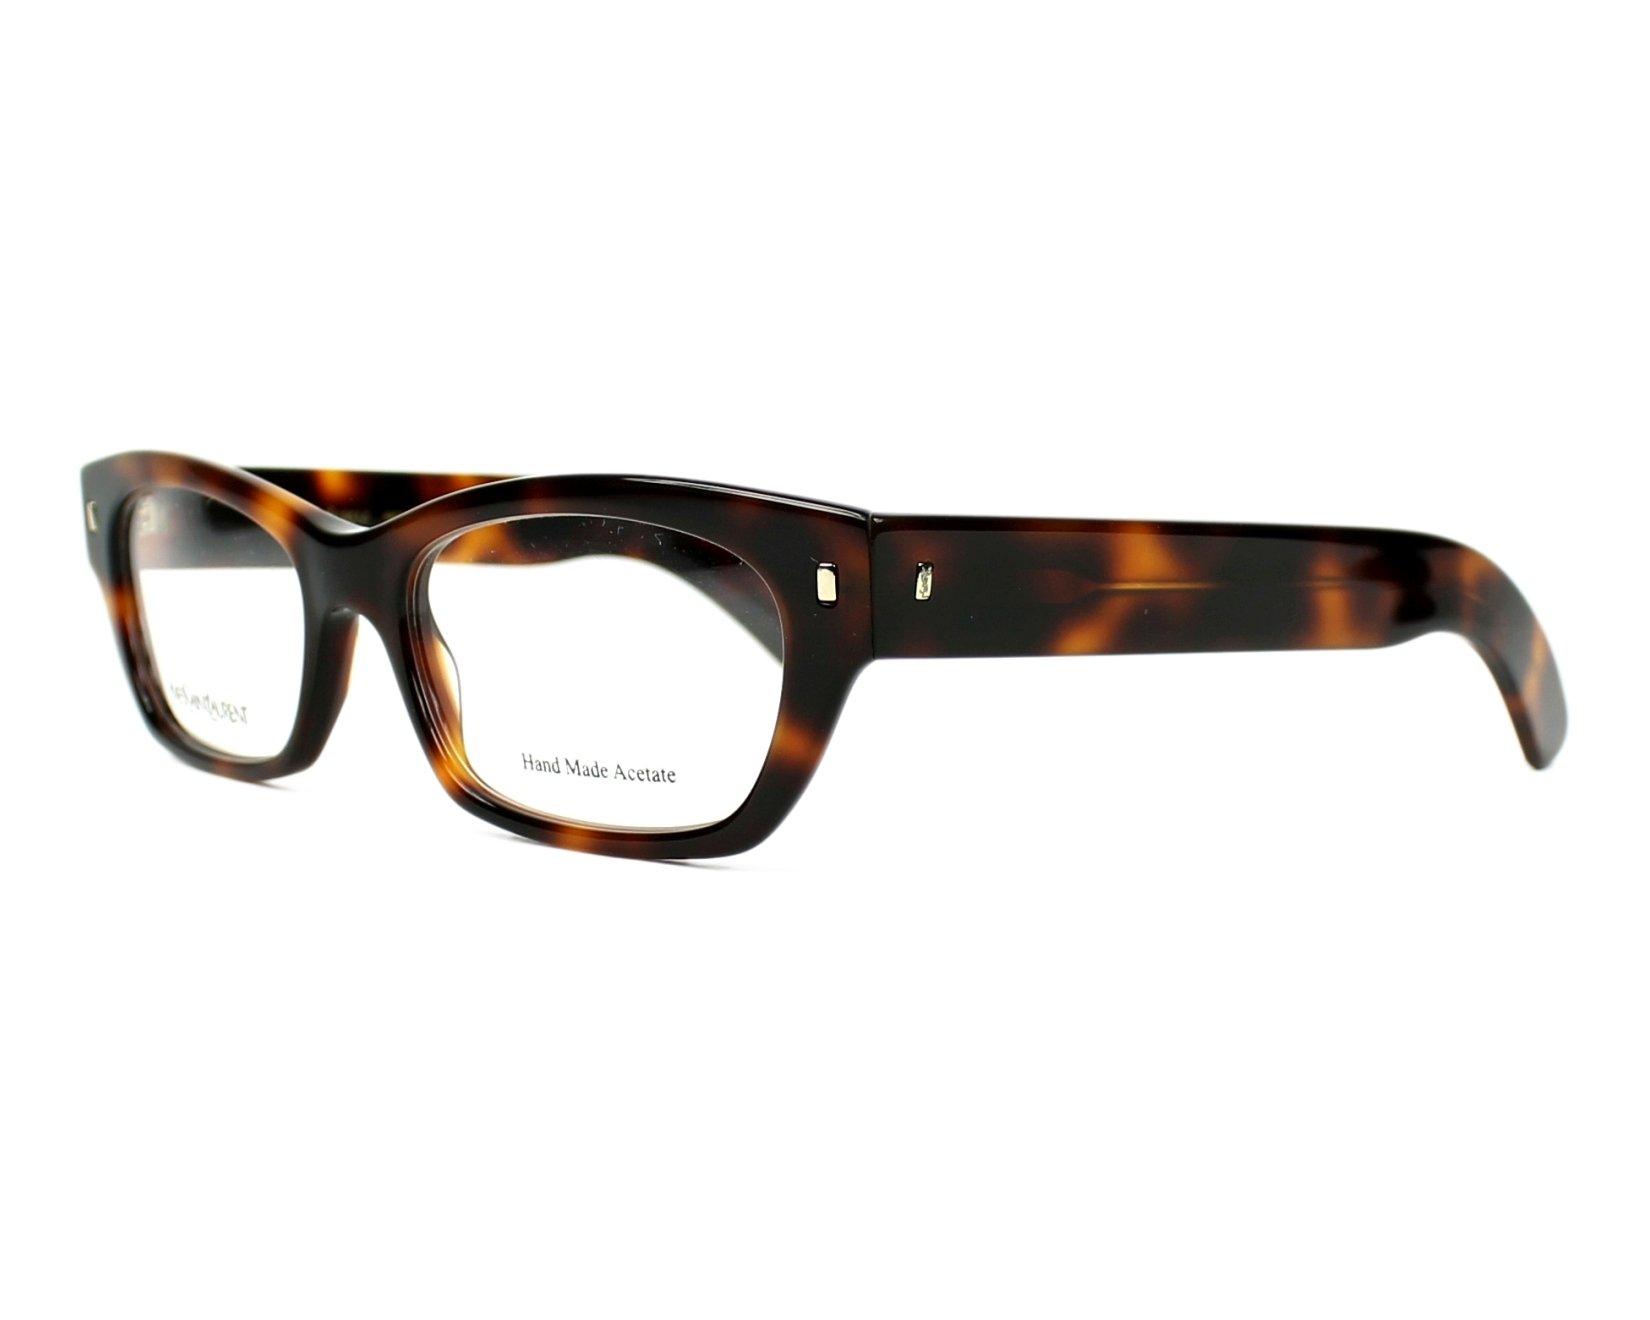 Order your Yves Saint Laurent eyeglasses YSL6333 05L 51 today